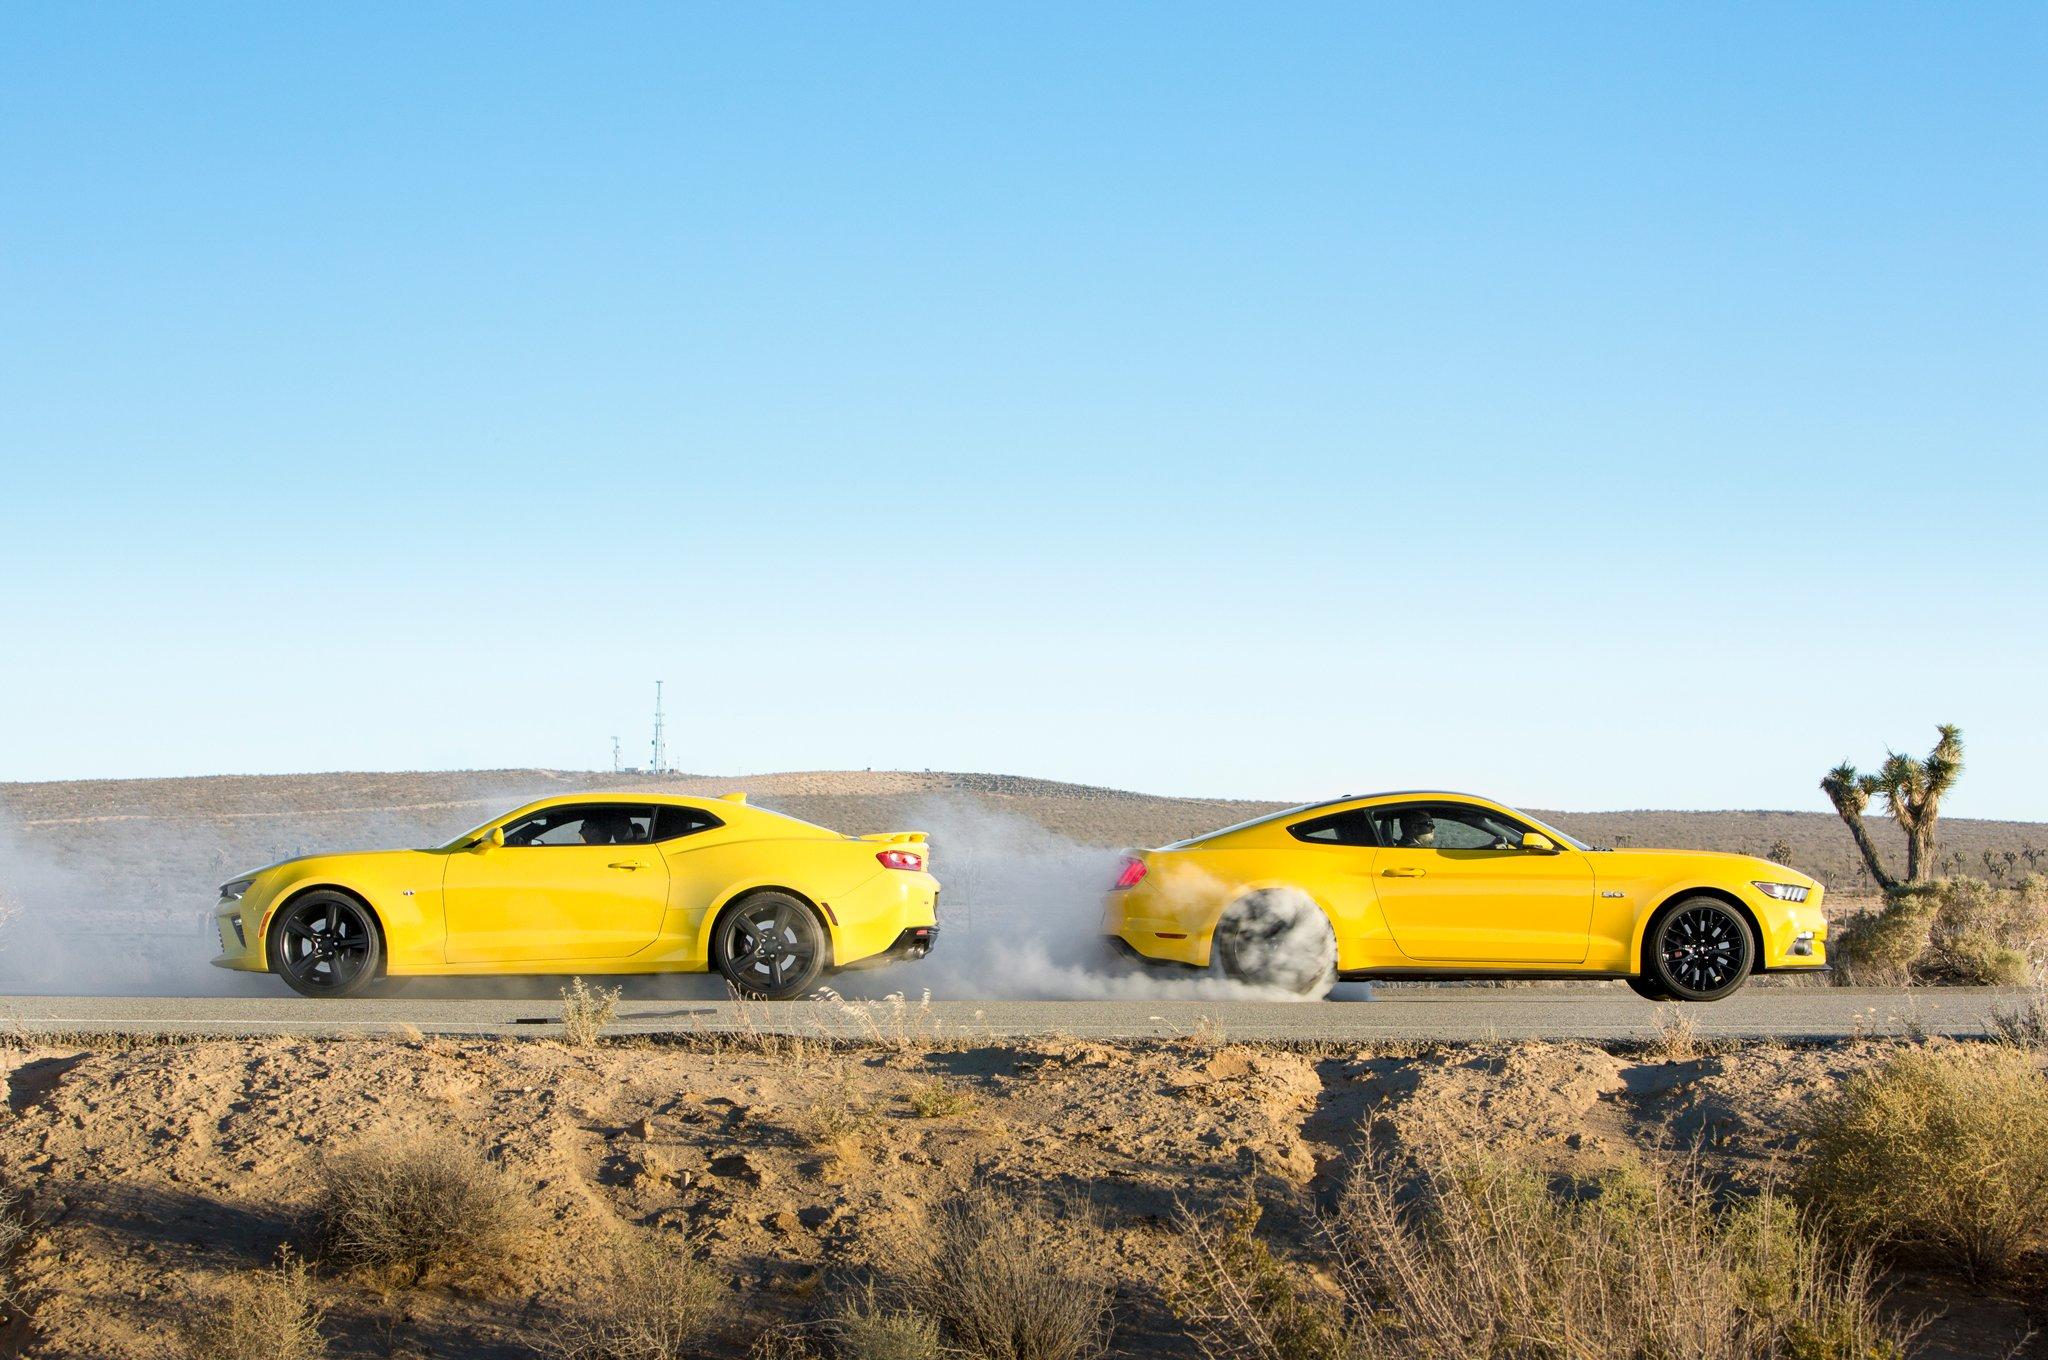 2016-Chevrolet-Camaro-SS-VS-Ford-Mustang-GT-side